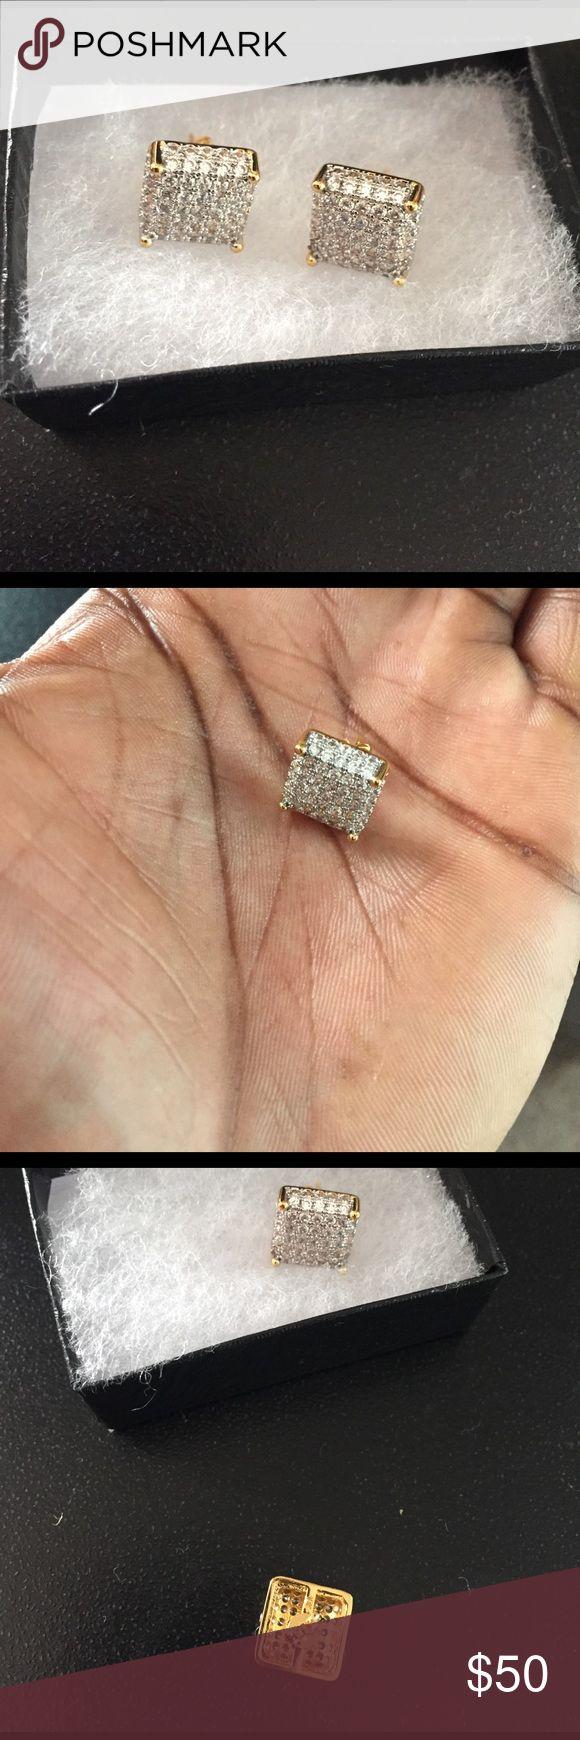 Men's earring Brand new diamond earring for men Accessories Jewelry